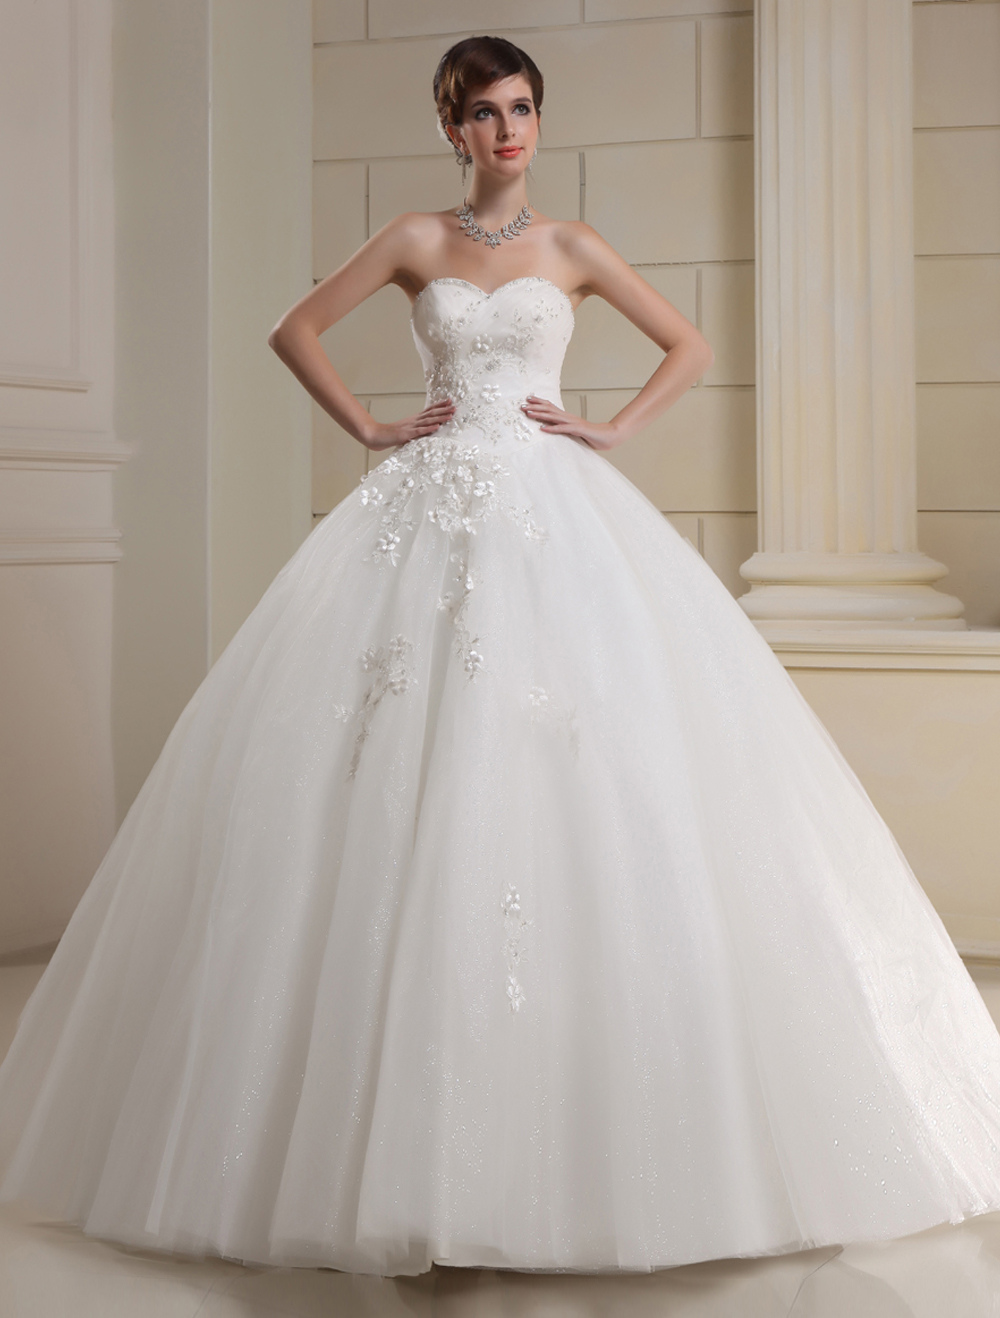 09bbbb548f Vestido de Noiva Sem alças Tule Flores Beading Plissado Decote ...